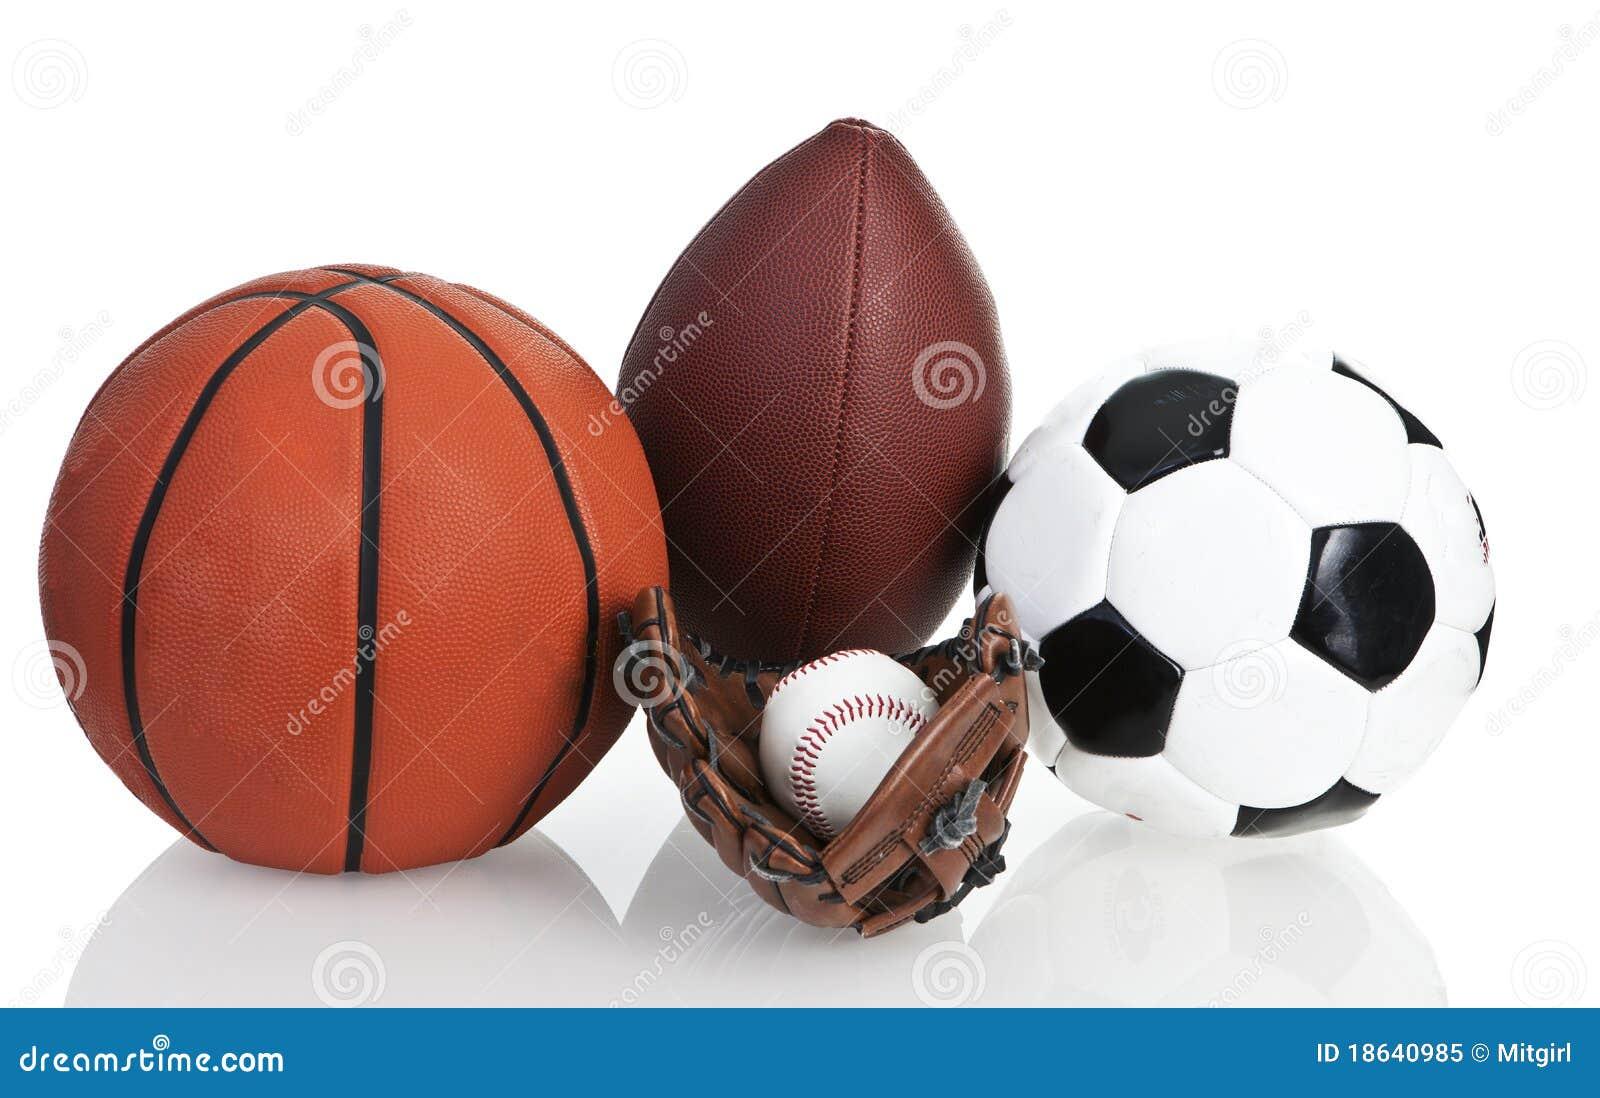 Color Sport Background Football Basketball Hockey Stock: Football, Soccerball, Baseball And Basketball Royalty Free